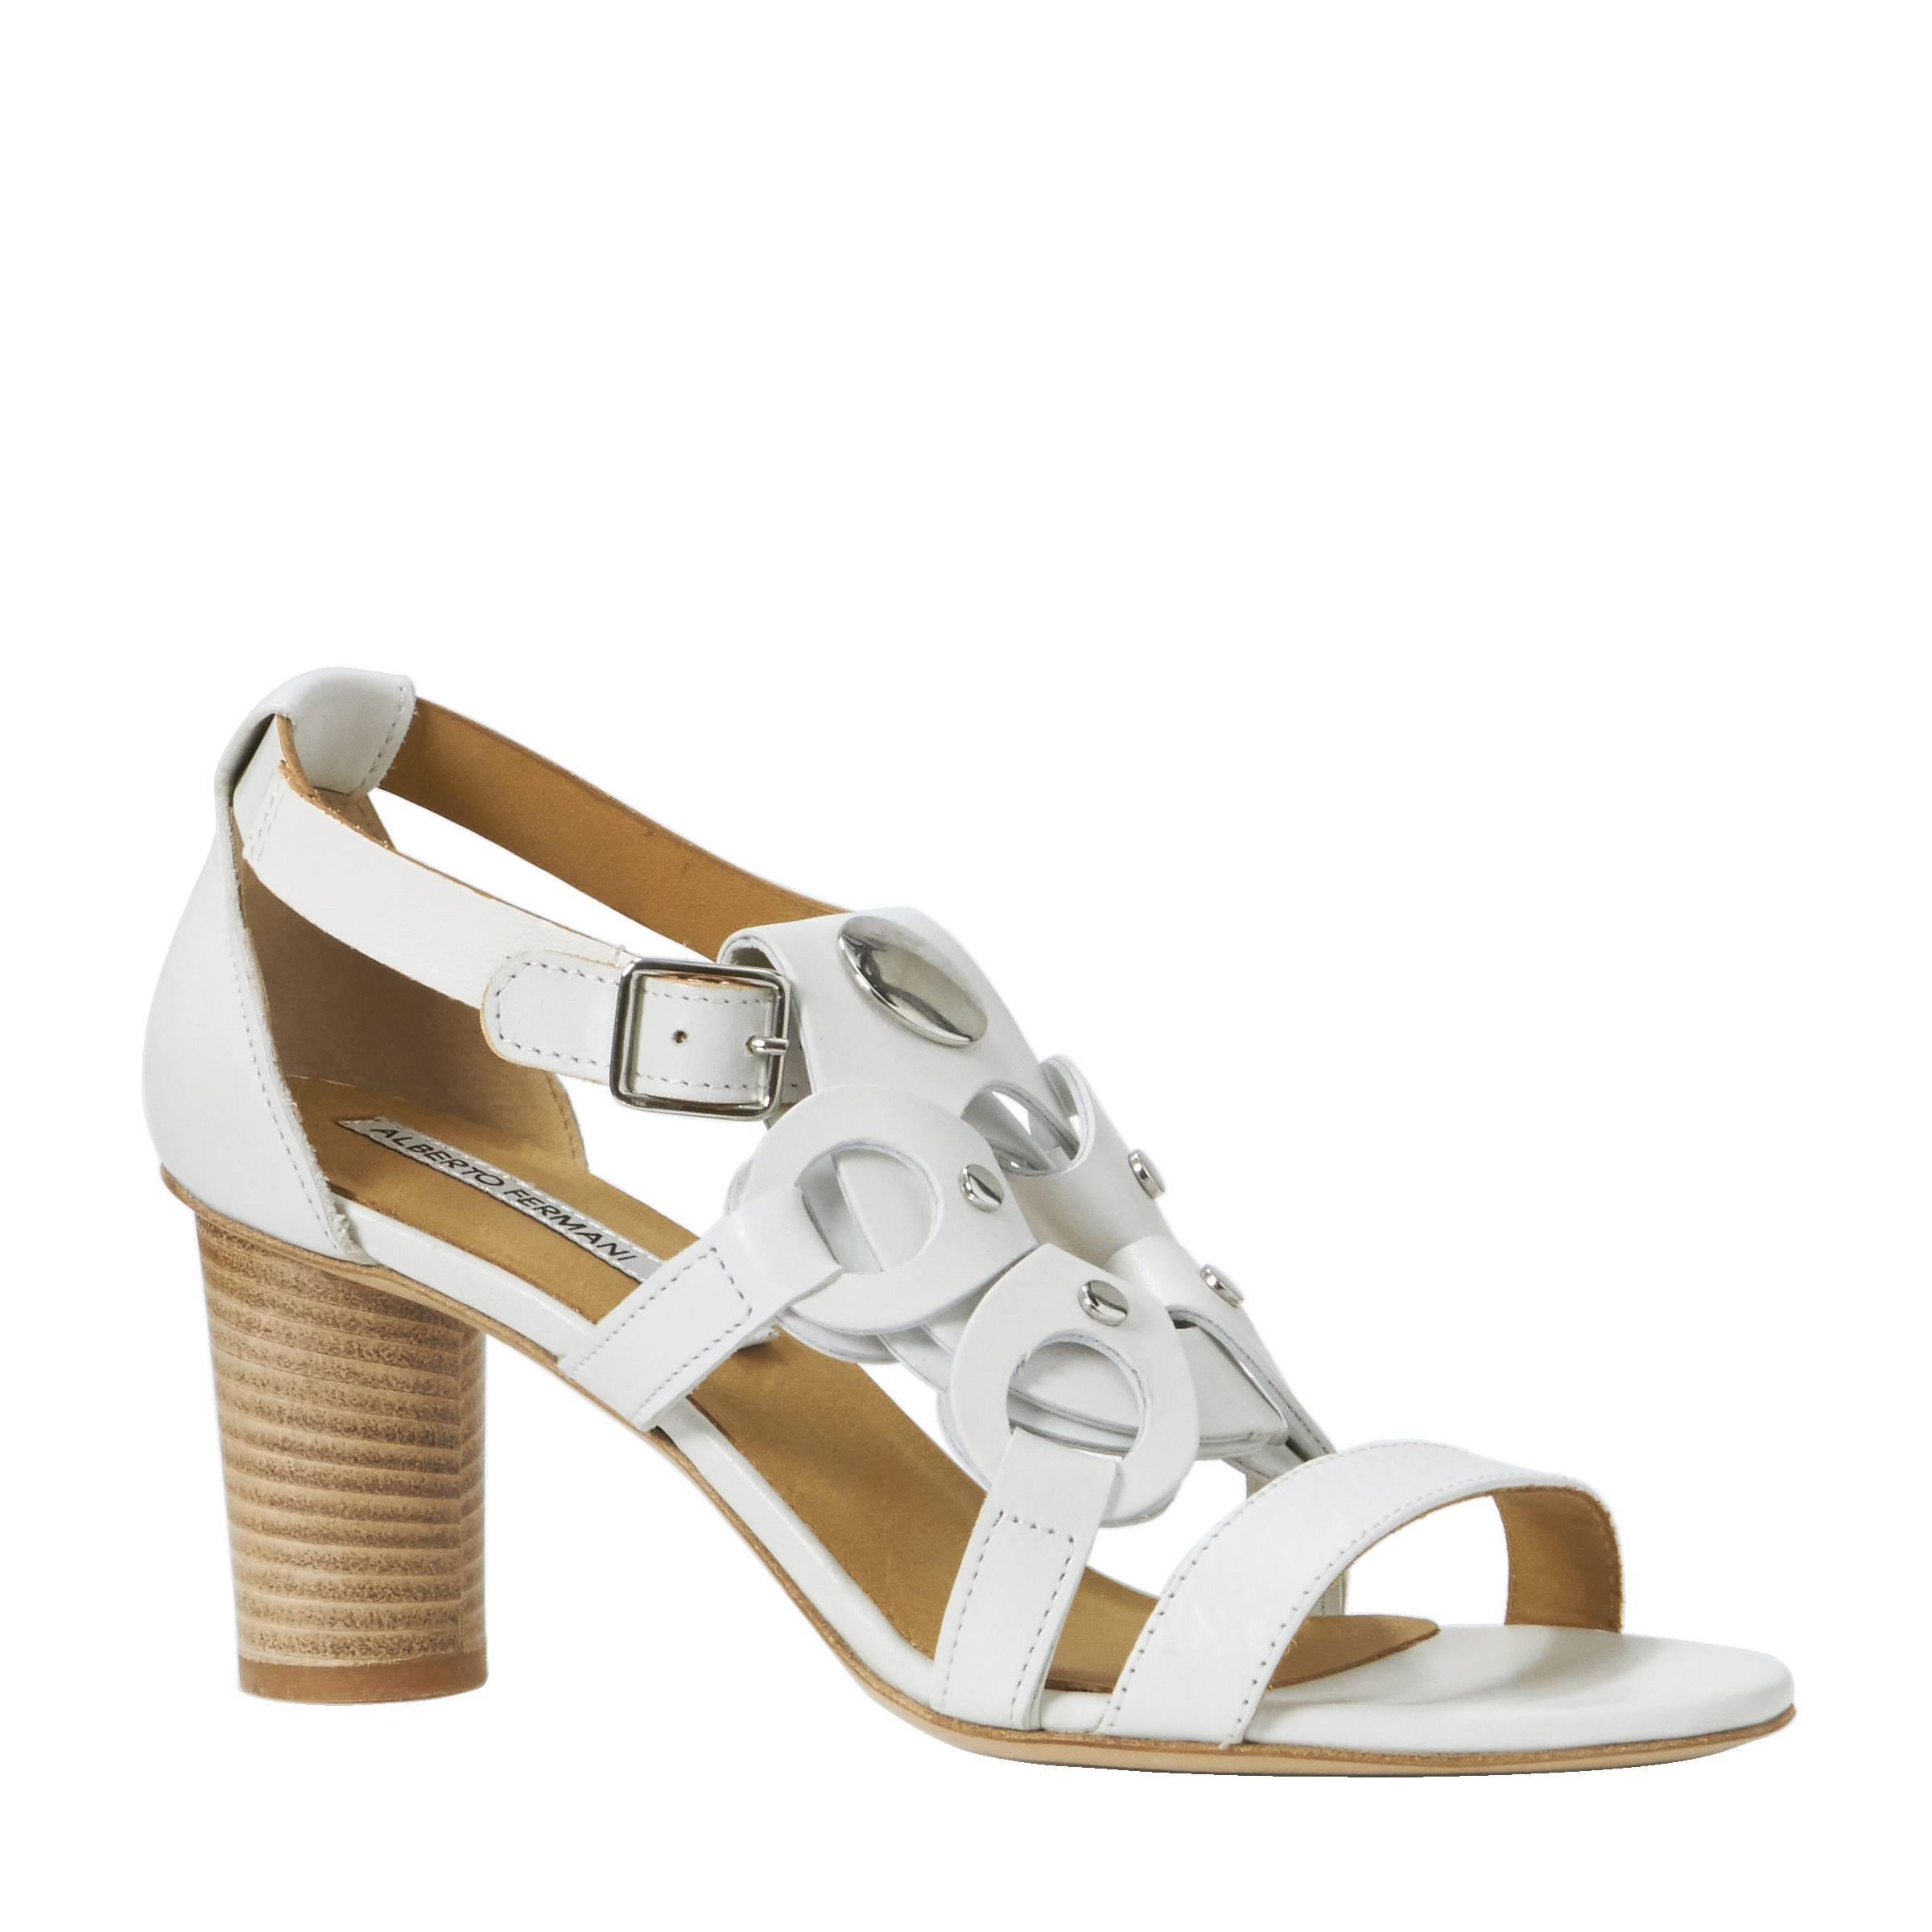 Alberto Fermani Chaussures Blanches Avec Boucle Pour Dames NePjplf5